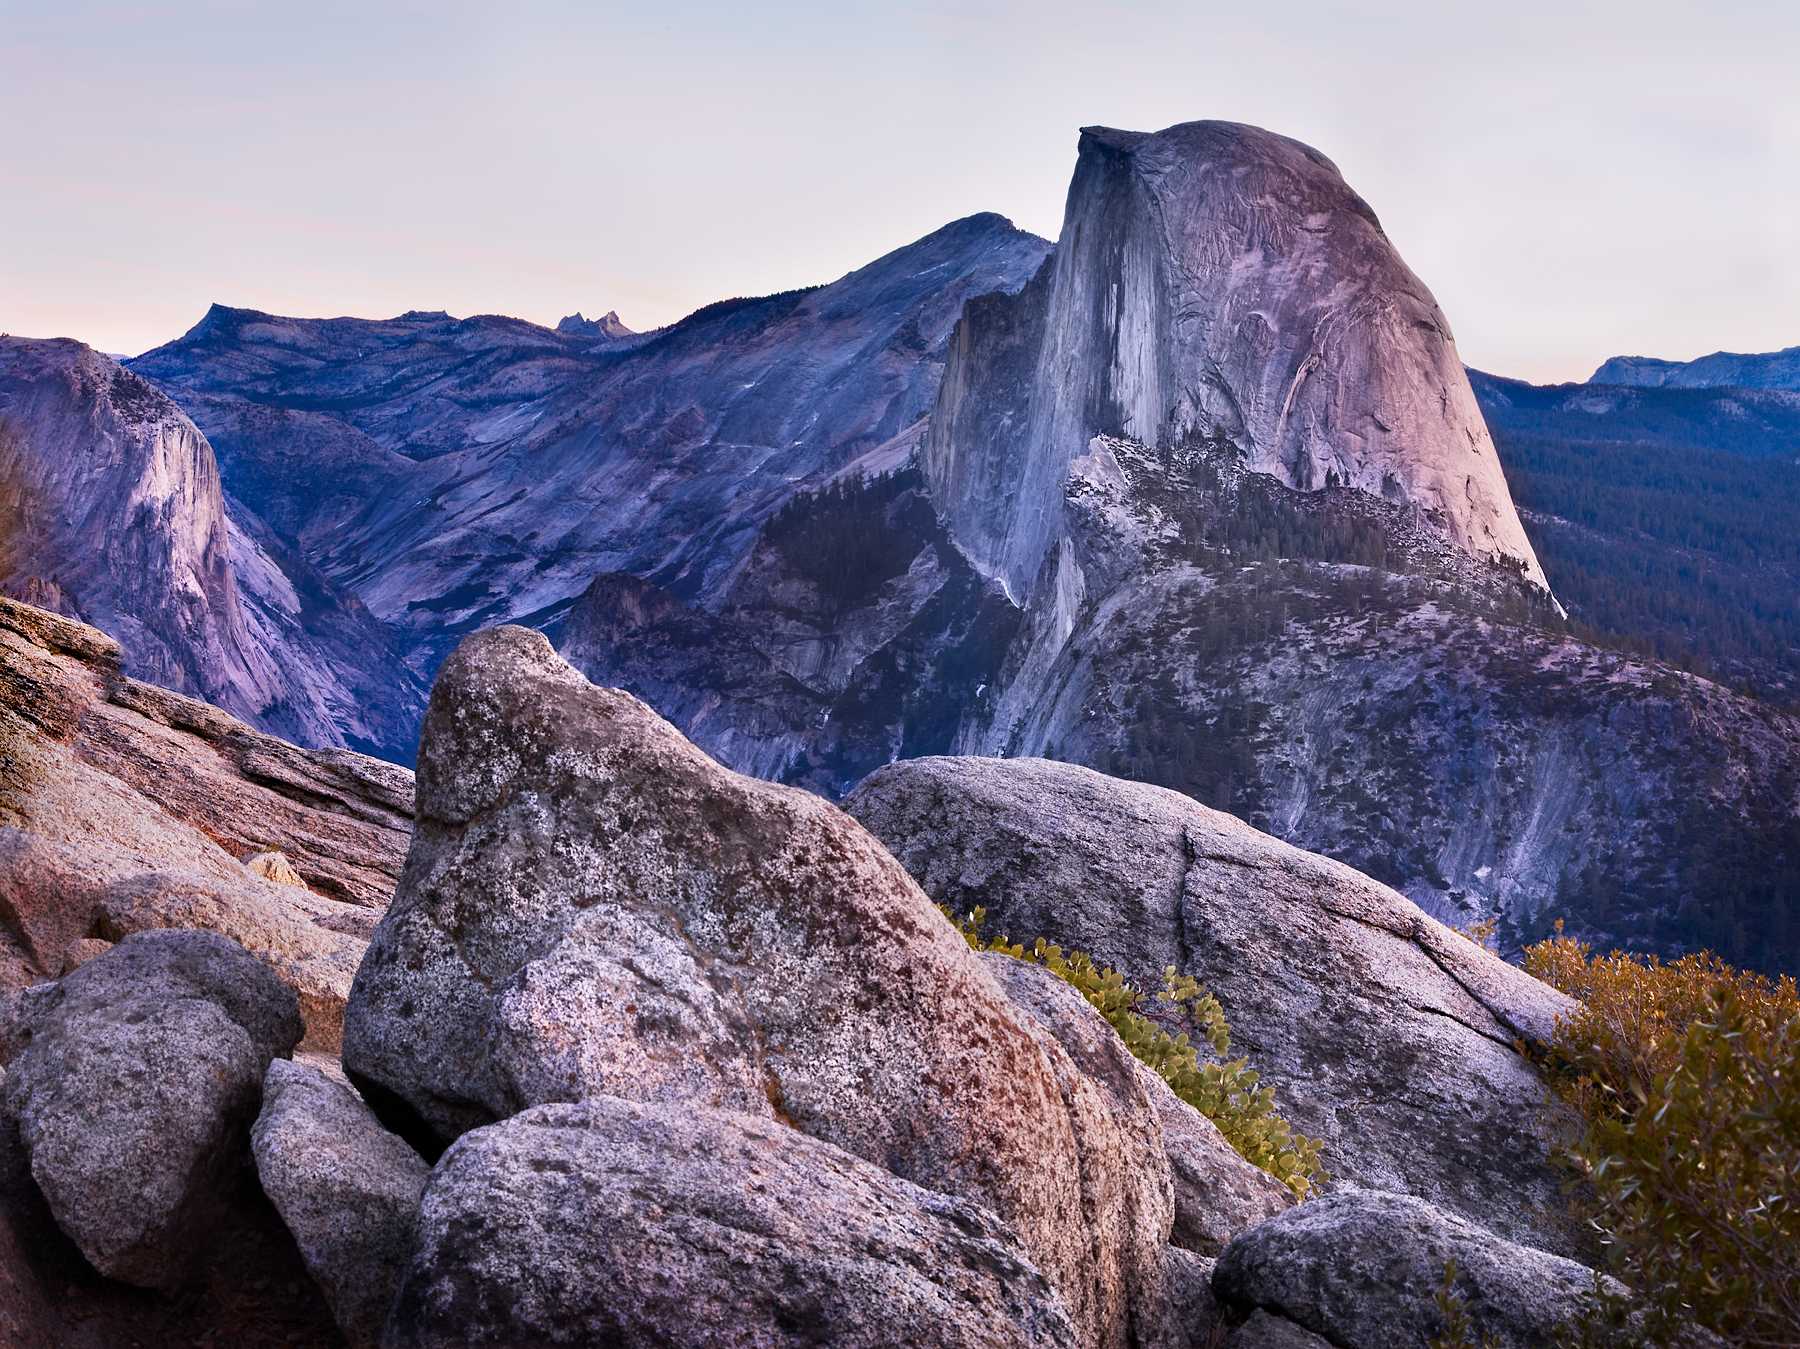 Glacier Point by Peter Adams.